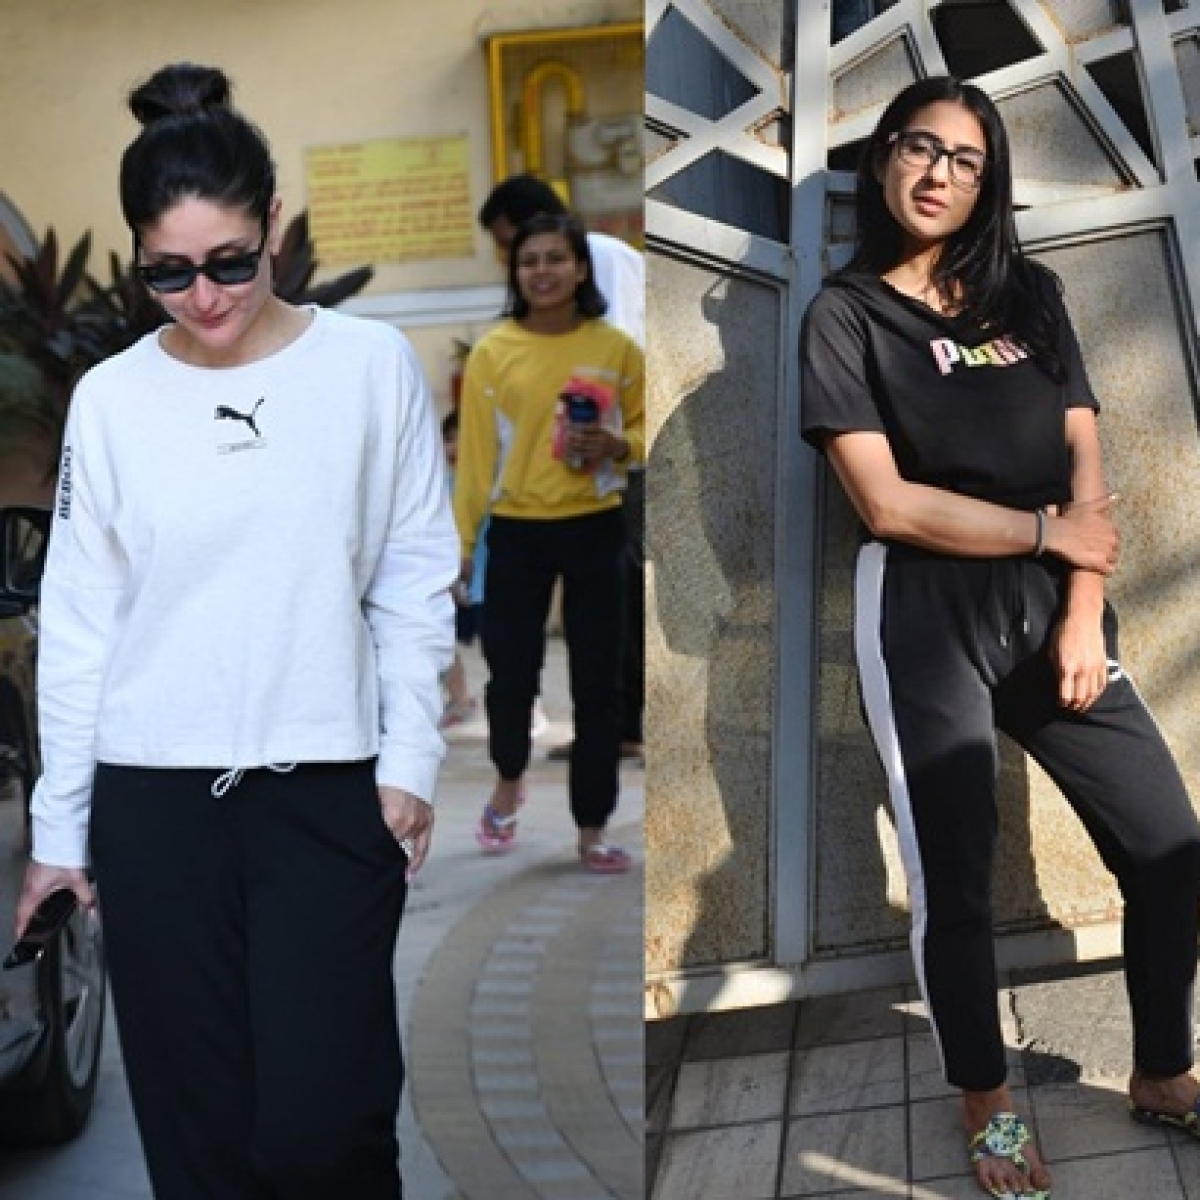 Celebrity spottings: Kareena Kapoor, Sara Ali Khan, Varun Dhawan and others captured by shutterbugs